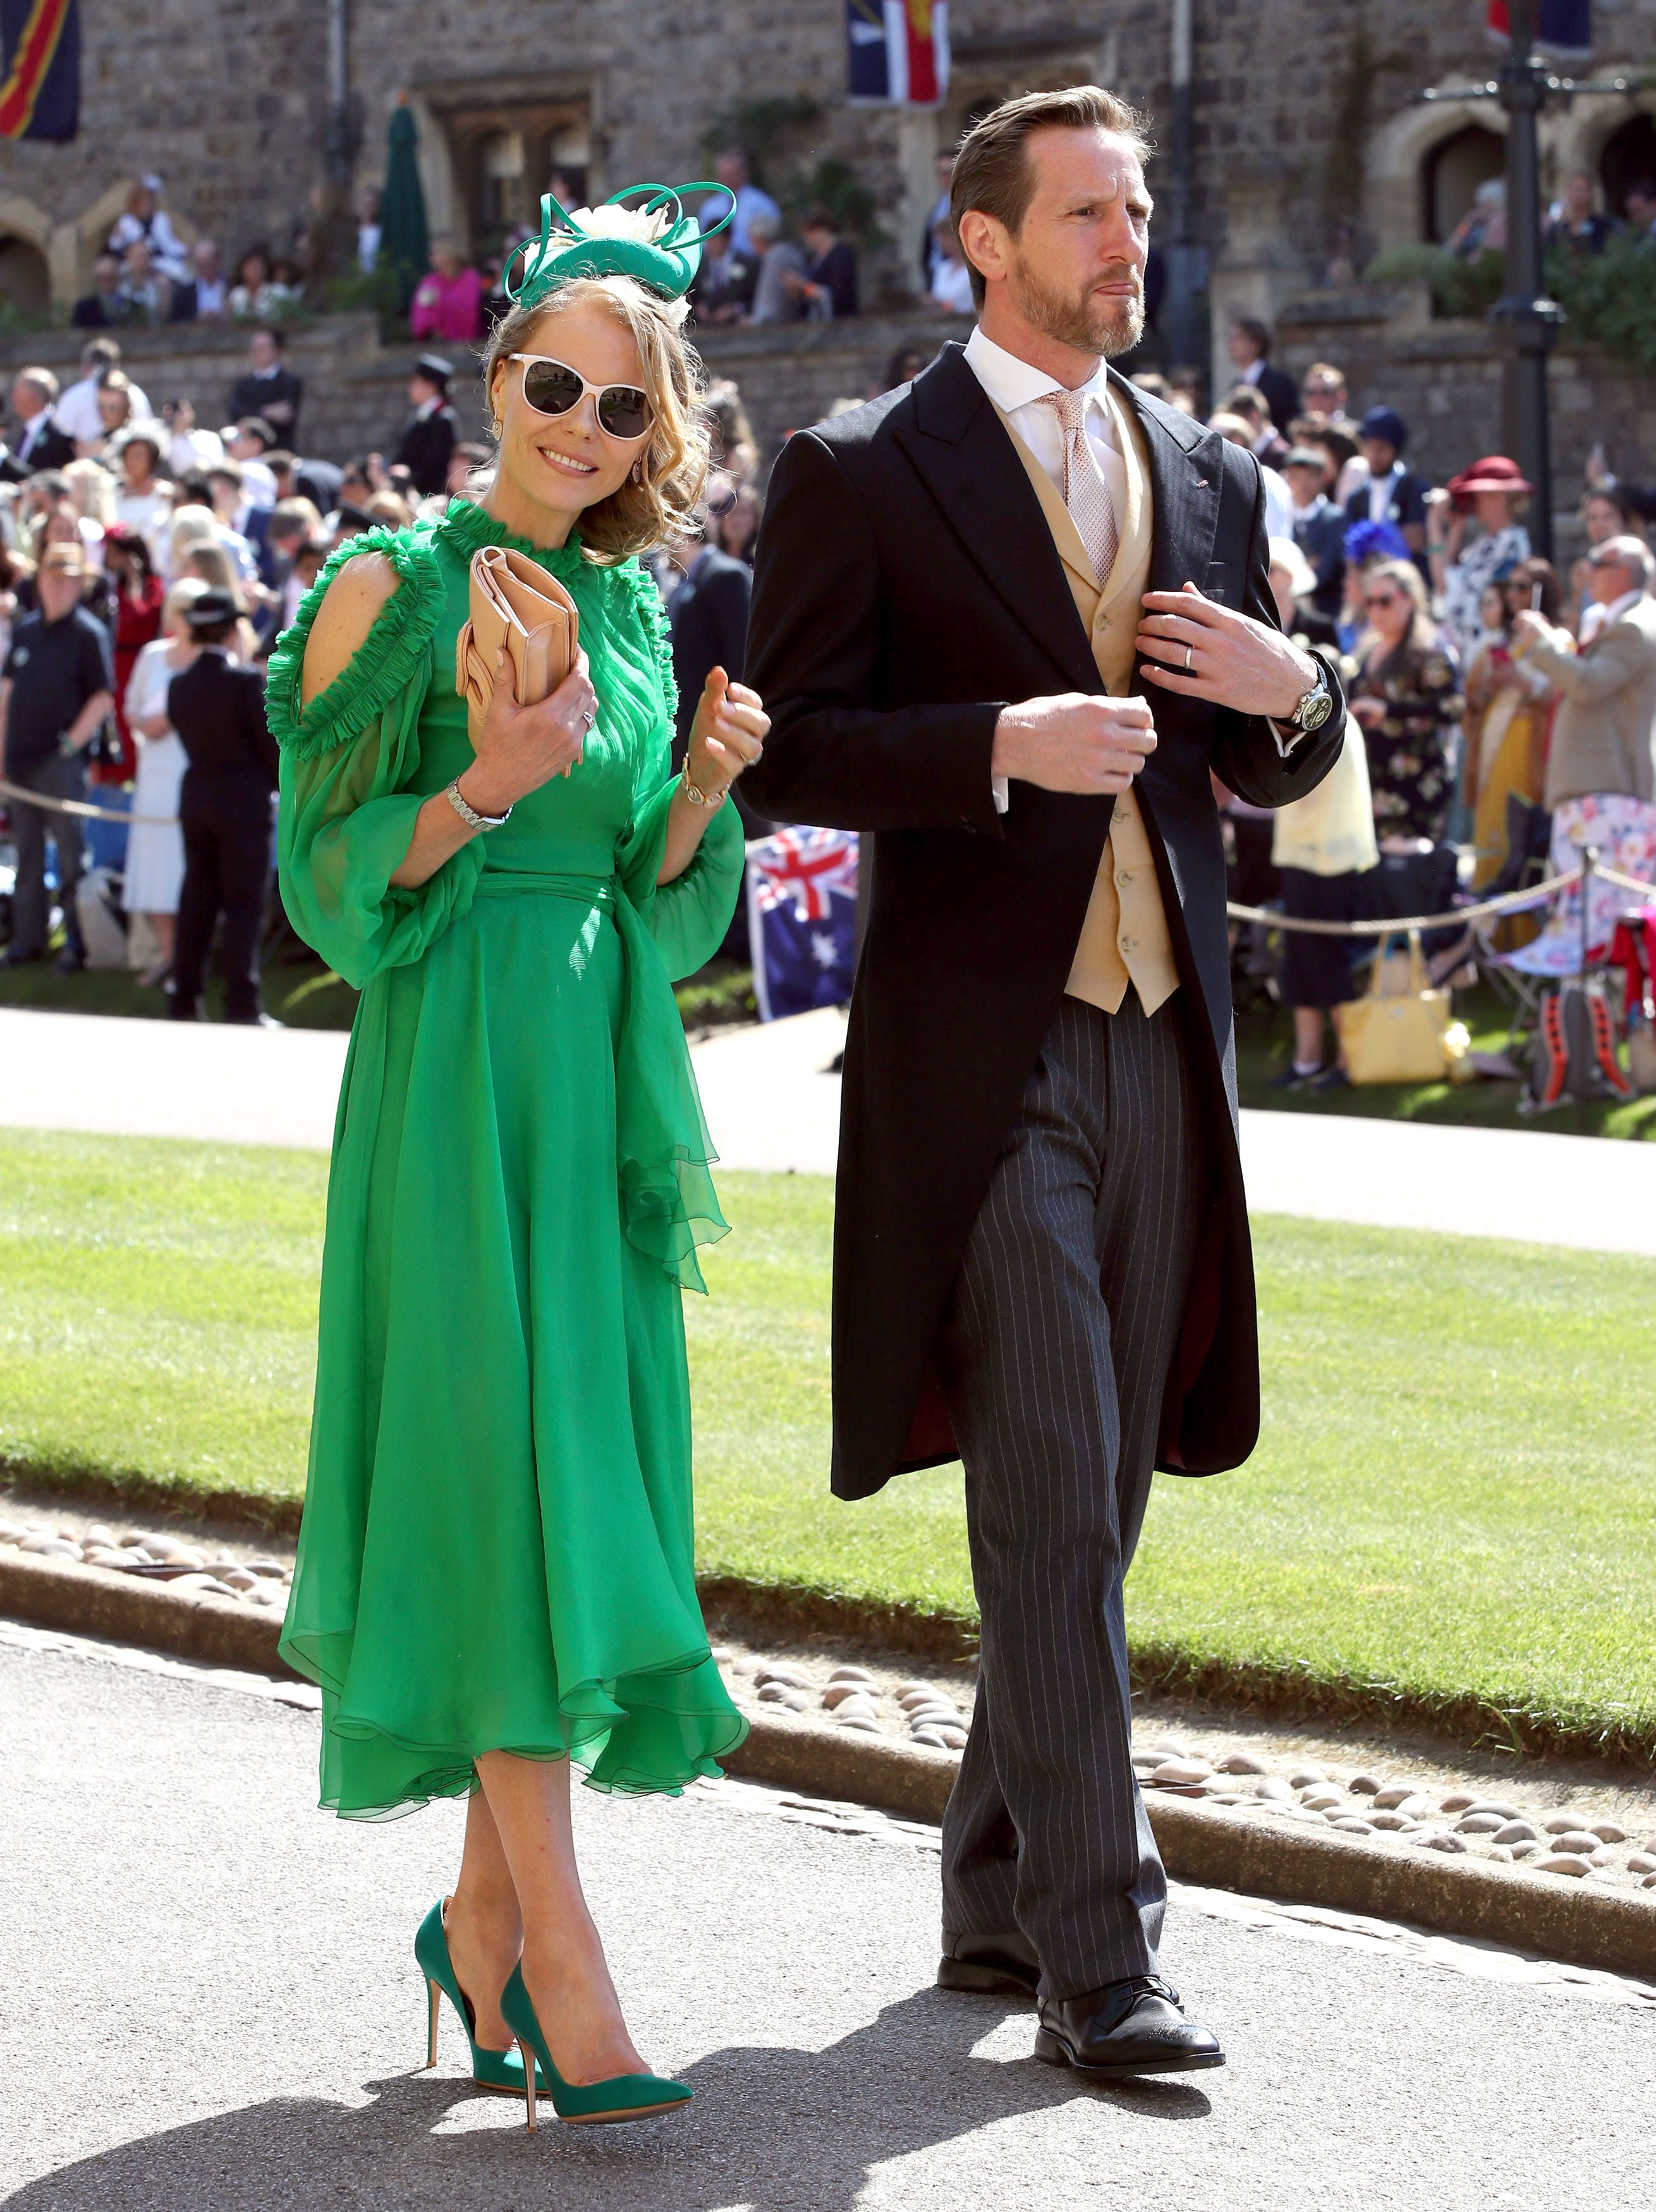 Royal Wedding Guests.Royal Wedding Best Dressed List Prince Harry And Meghan